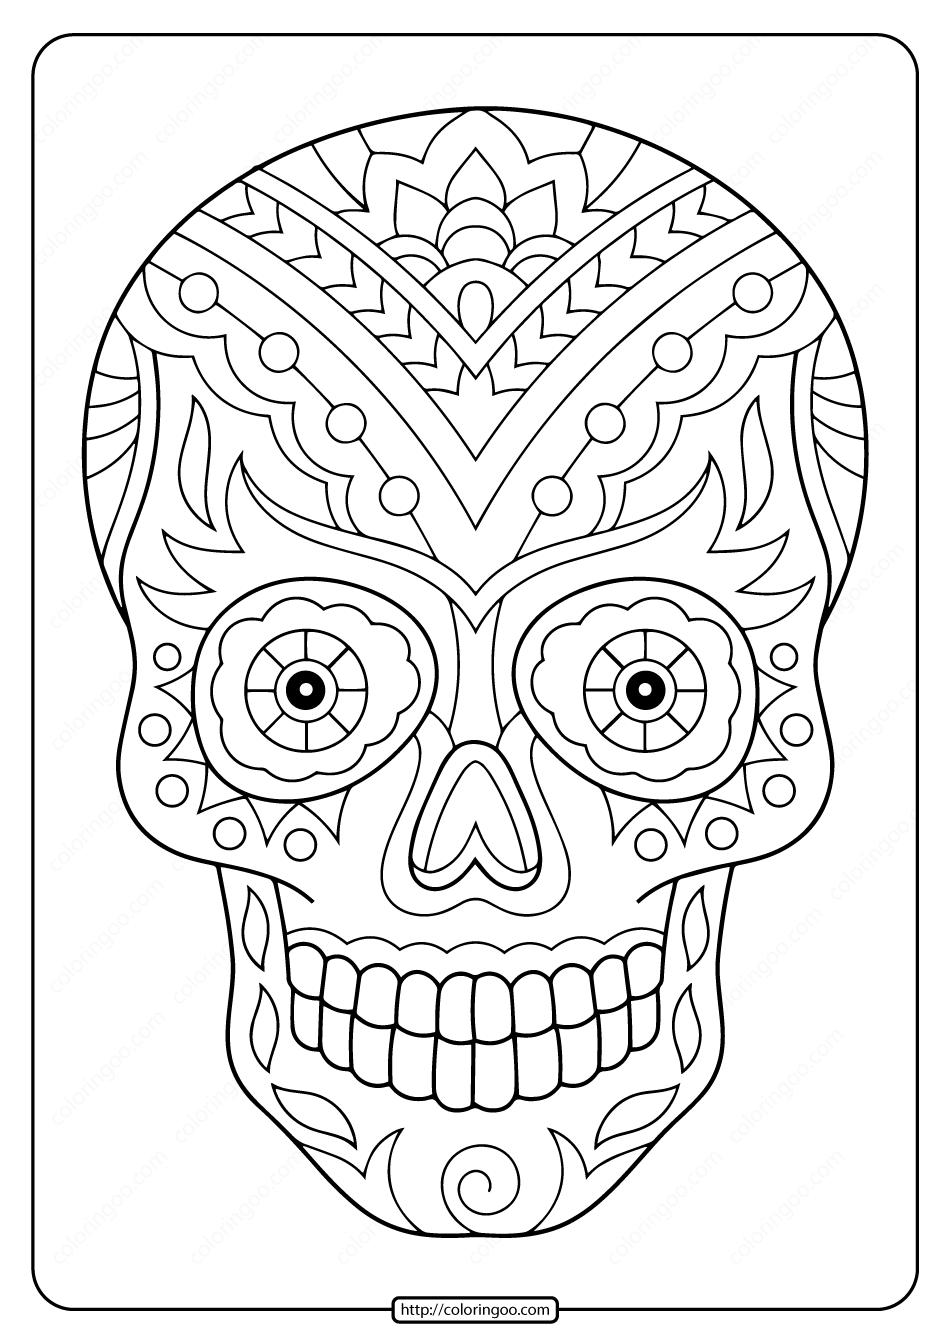 Printable Sugar Skull Pdf Coloring Pages 09